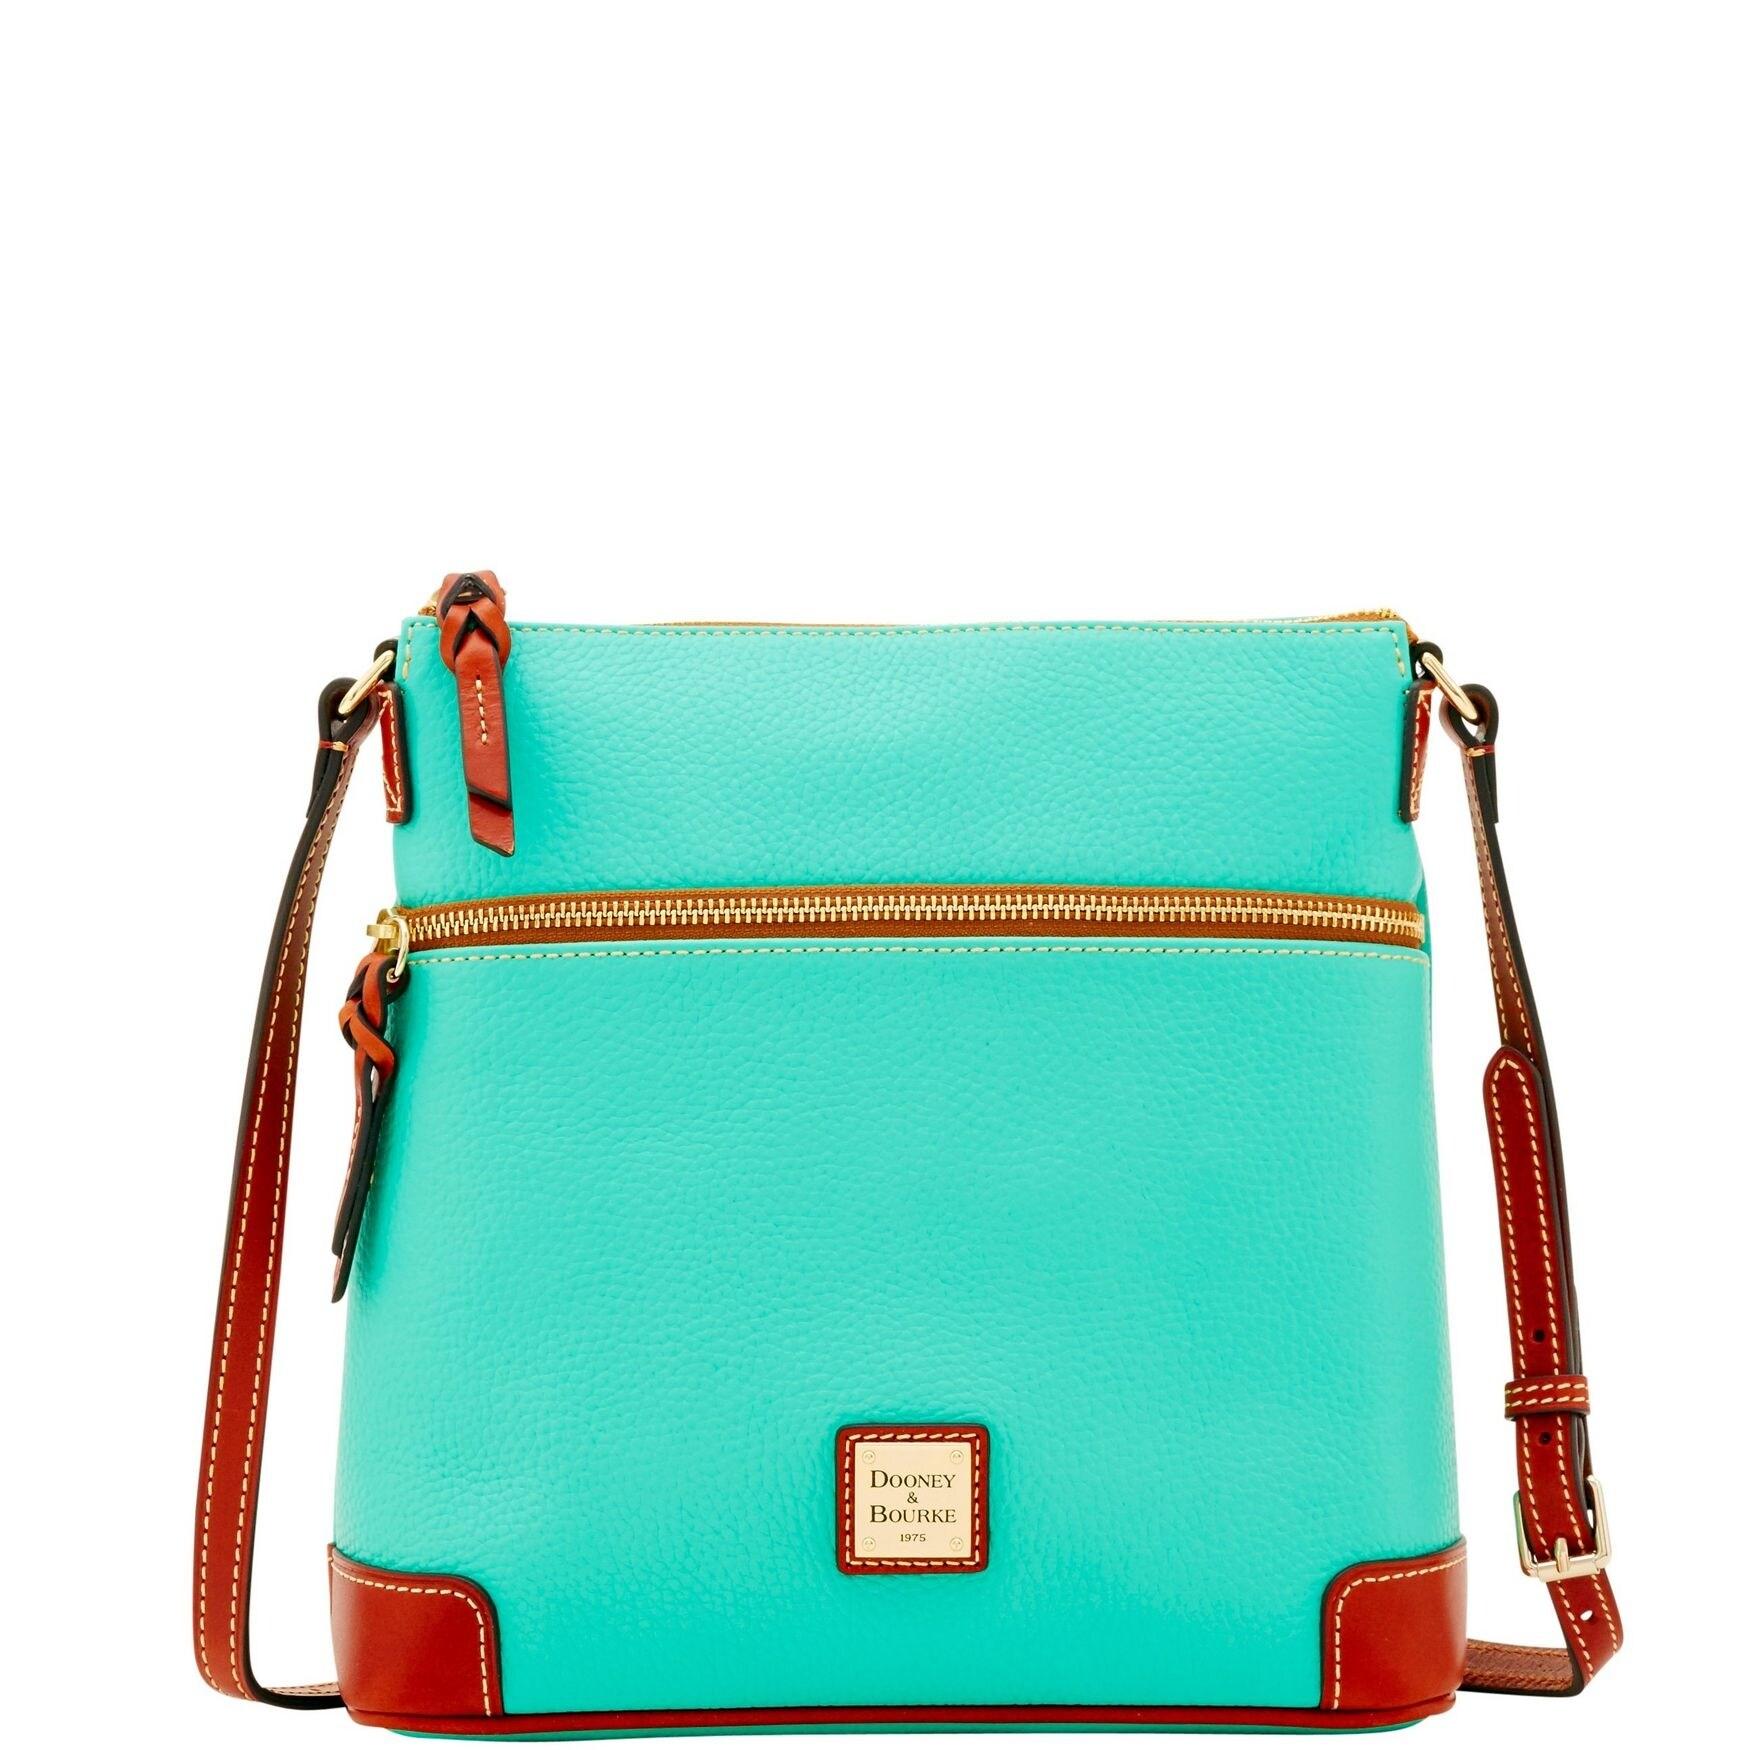 ebc422932 Designer Handbags   Find Great Designer Store Deals Shopping at Overstock